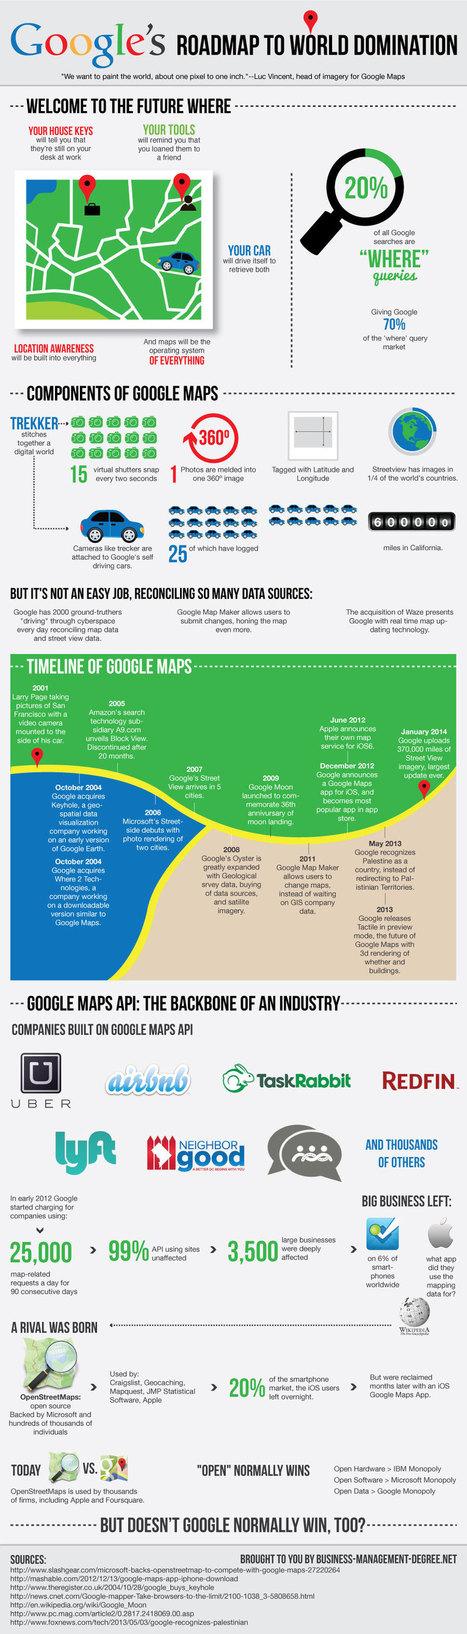 Todo lo que debes saber sobre Google Maps #infografia #infographic #maps | communitymanagerspain | Scoop.it